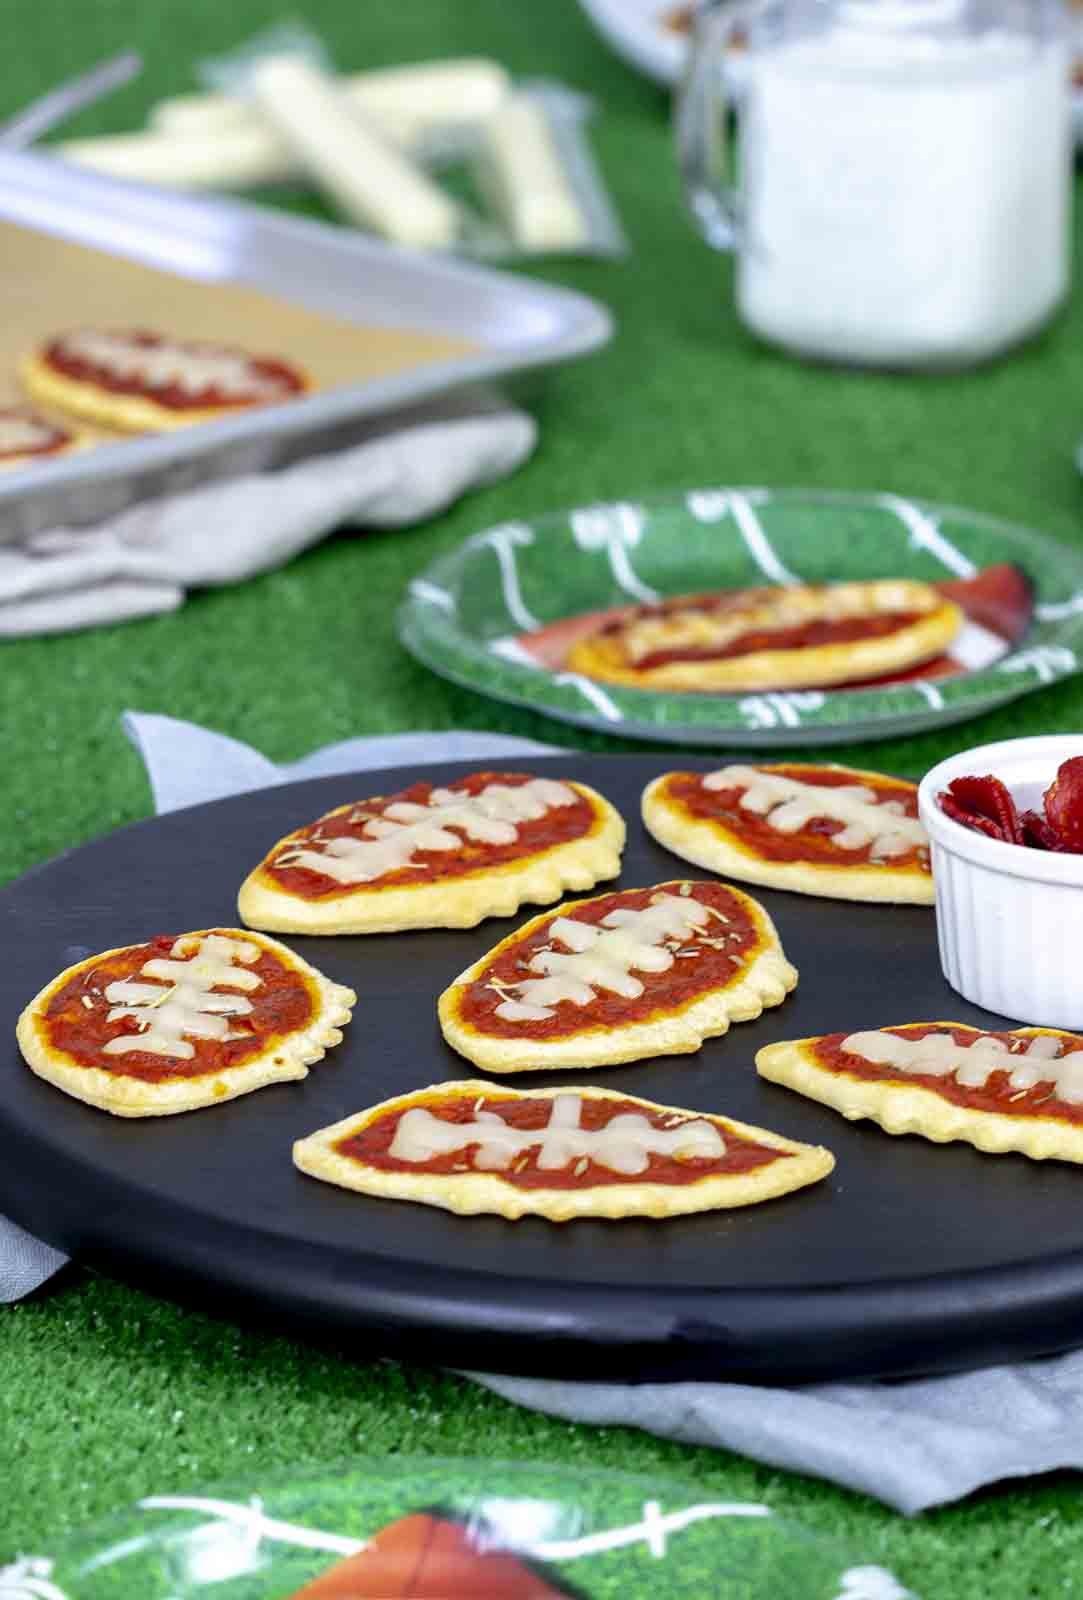 Mini pizza footballs on cutting board with football backdrop.